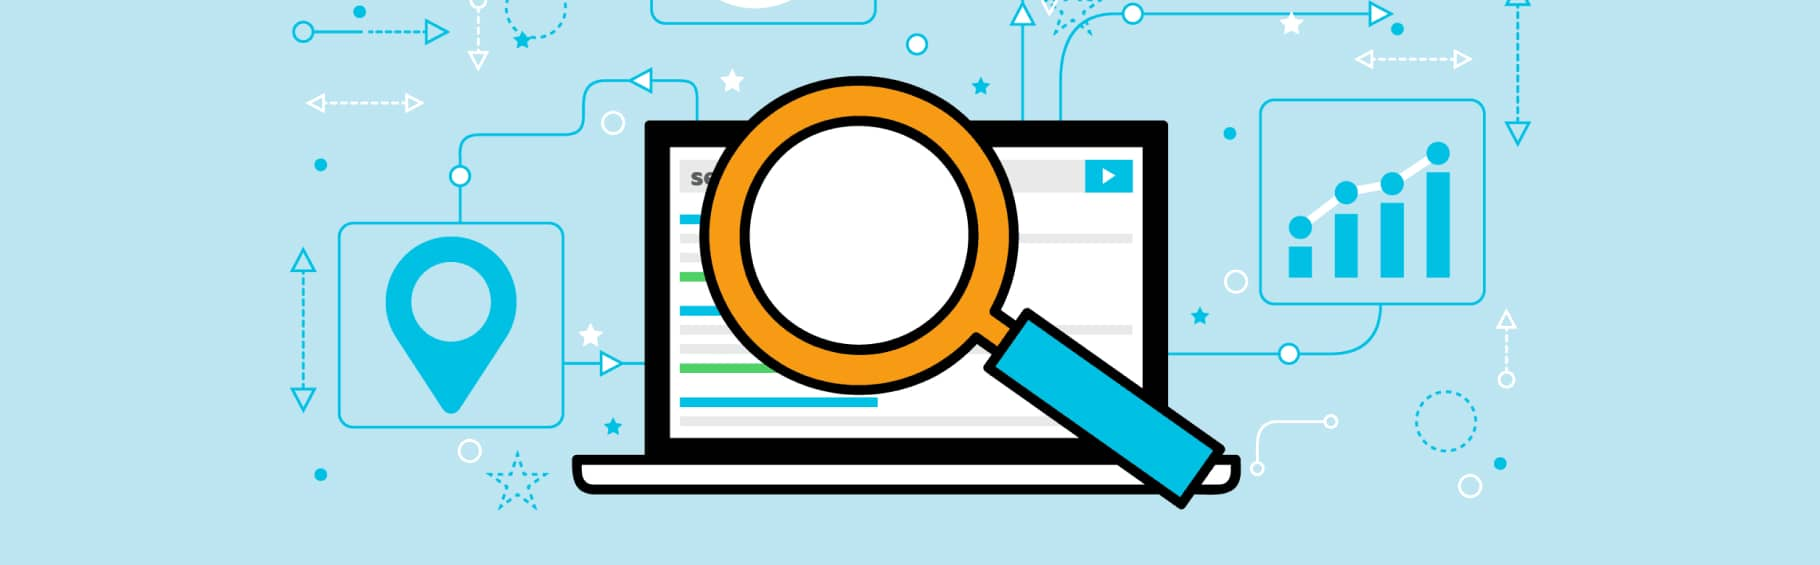 Google SEO Search Tips